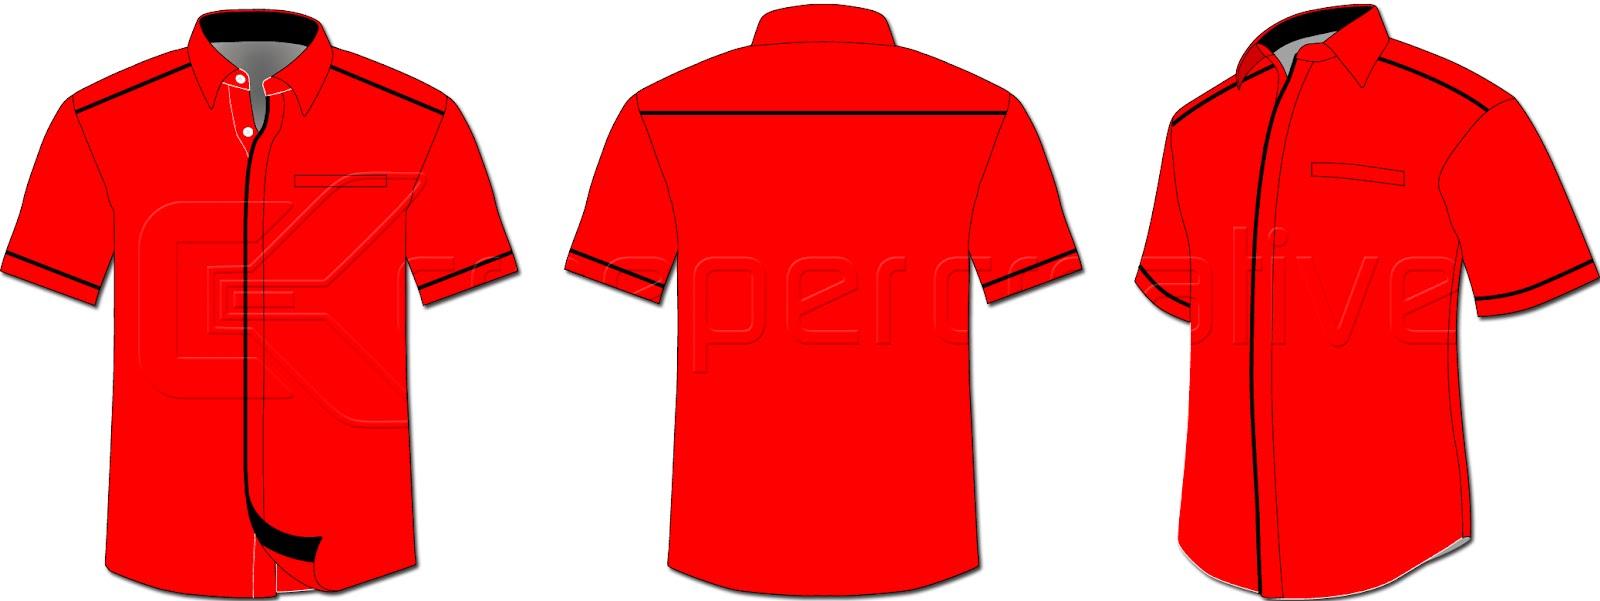 Corporate Shirt Cs 02 Series Creeper Design